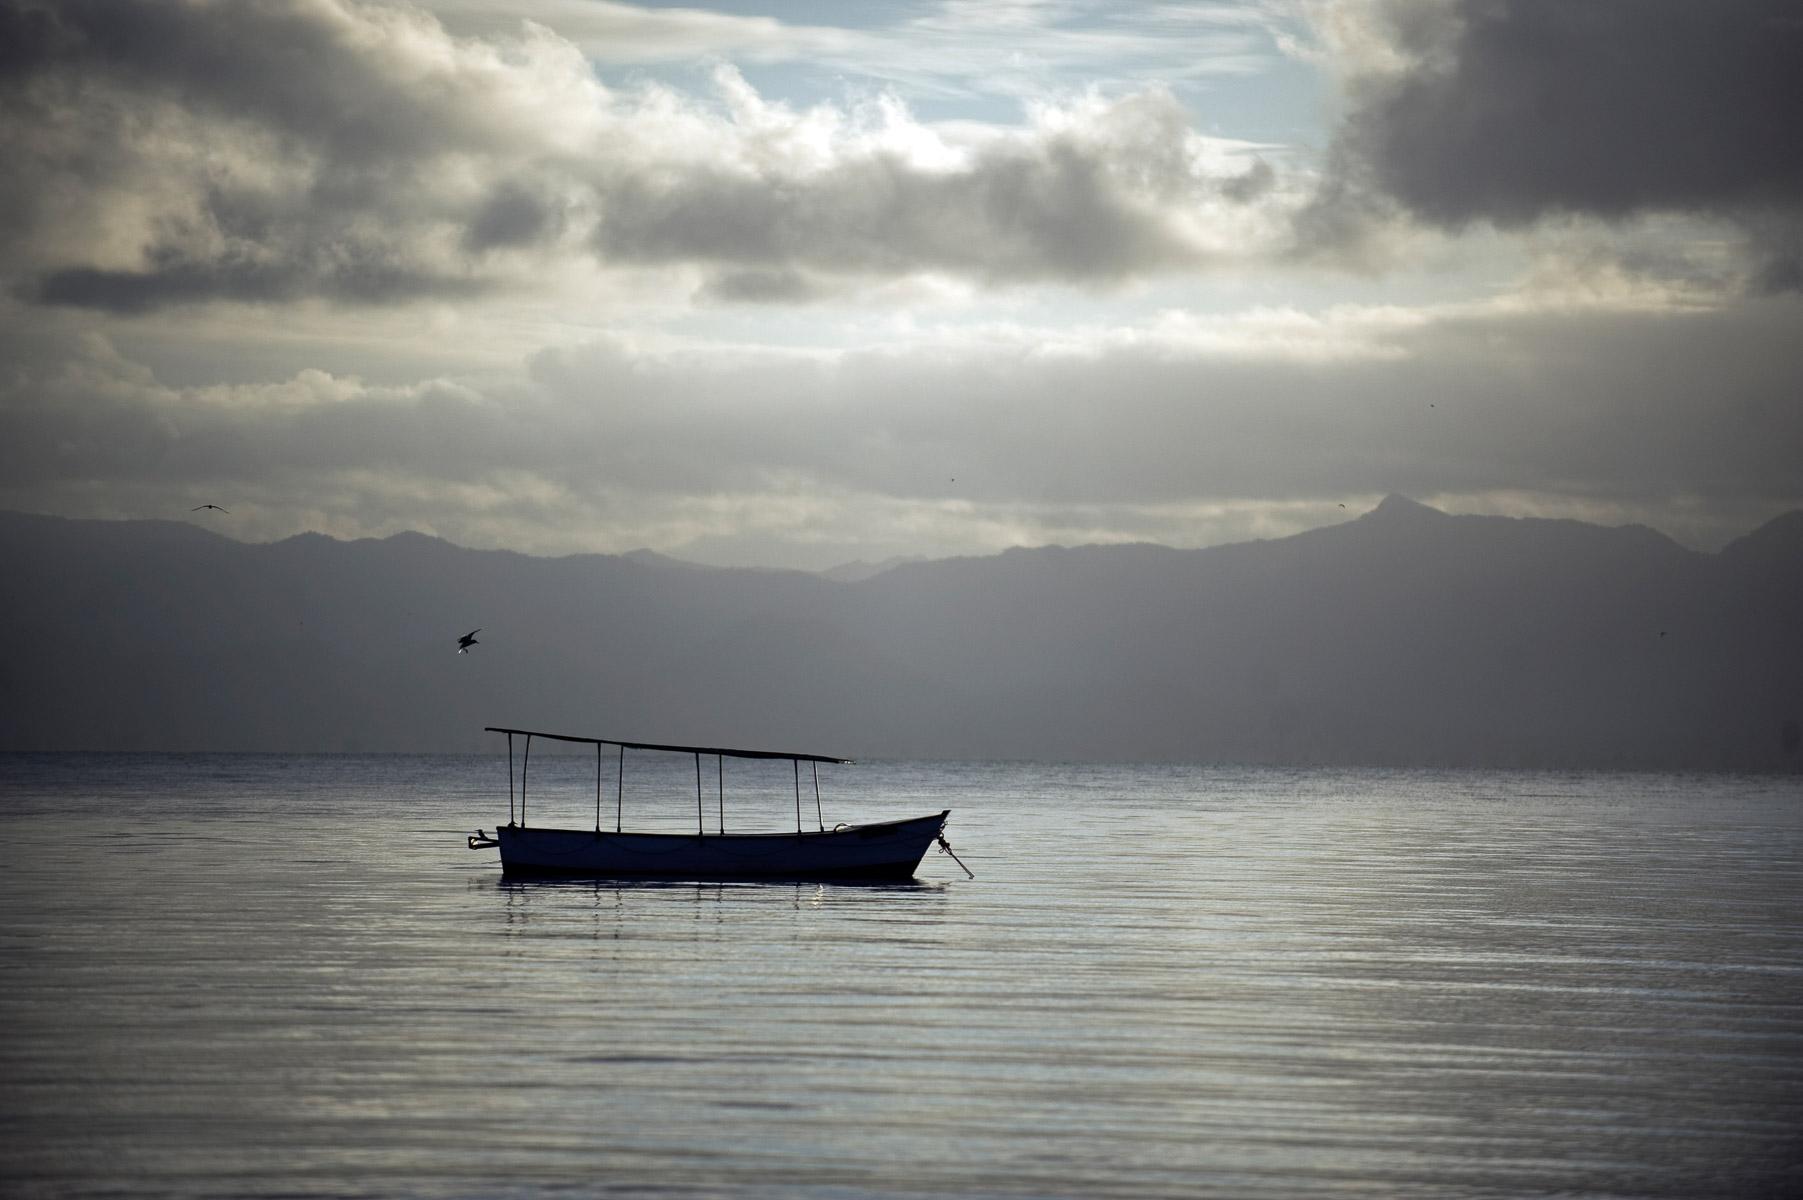 Lake Malawi in Nkopola, Malawi. 4/9/2009. ©Vanessa Vick